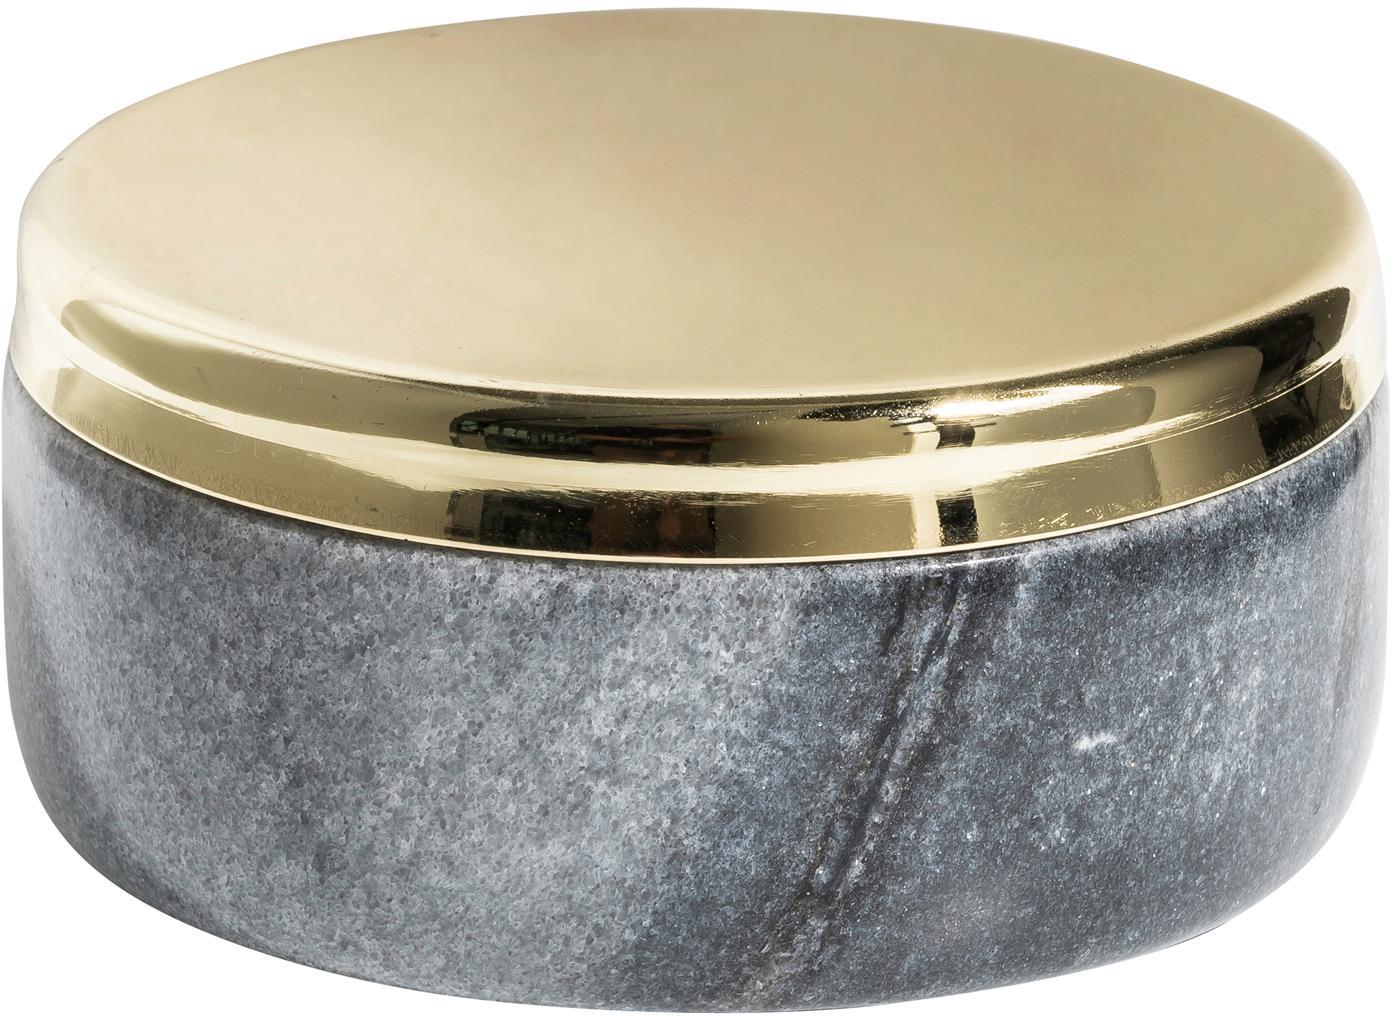 Bote de mármol Sakata, Mármol, metal, Gris, dorado, Ø 10 x Al 4 cm